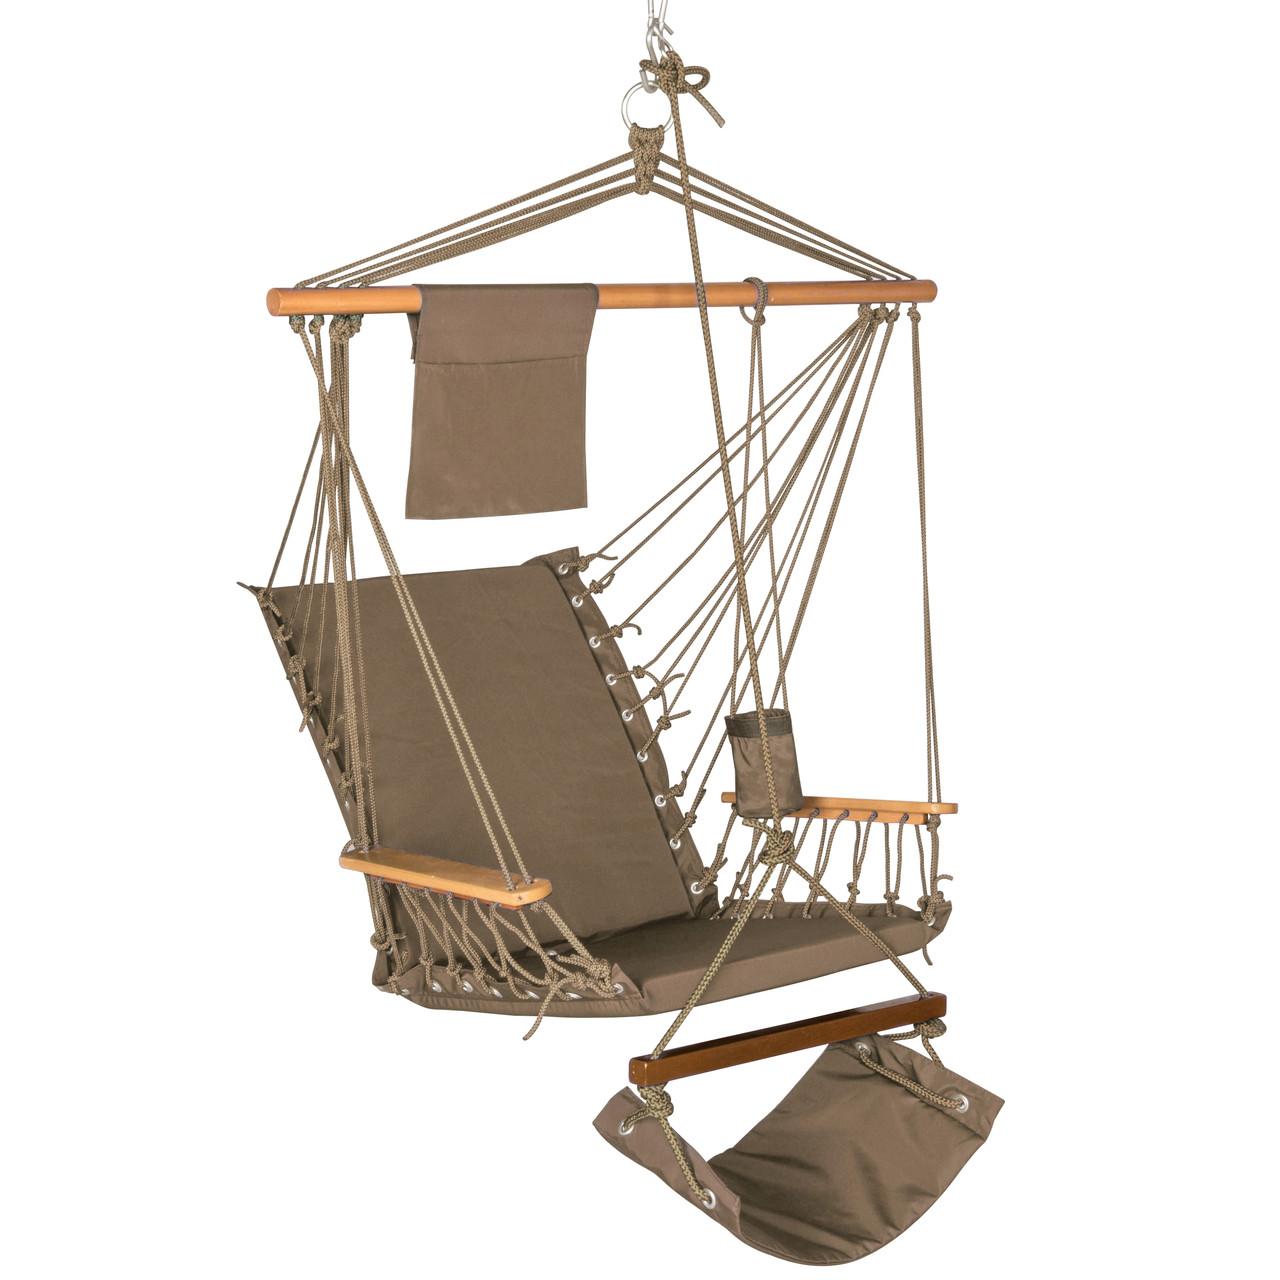 Lazy Daze Hammocks Hanging Rope Chair Cotton Padded Swing Chair